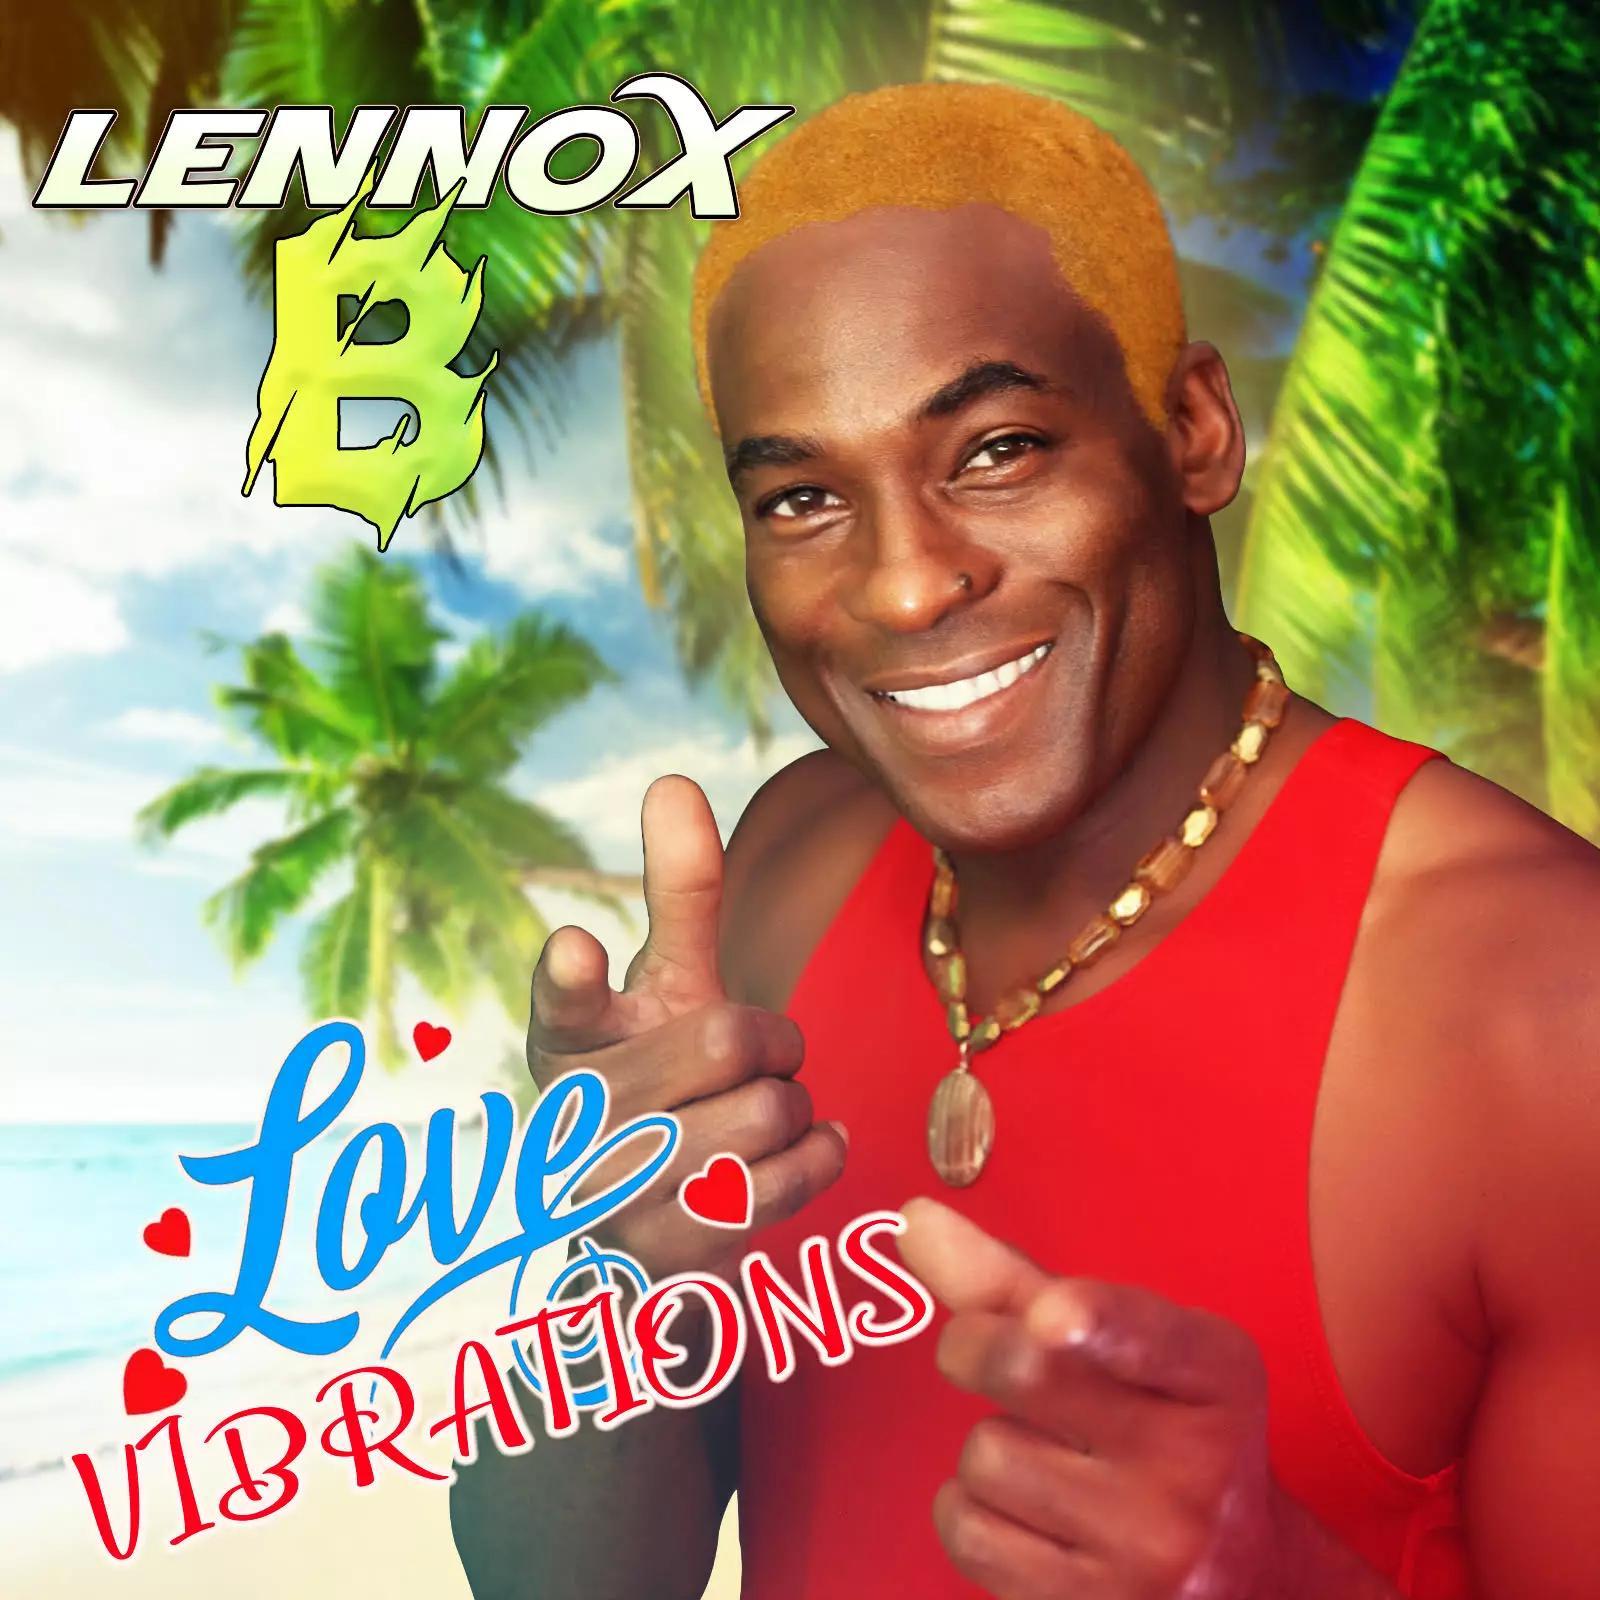 lennox b